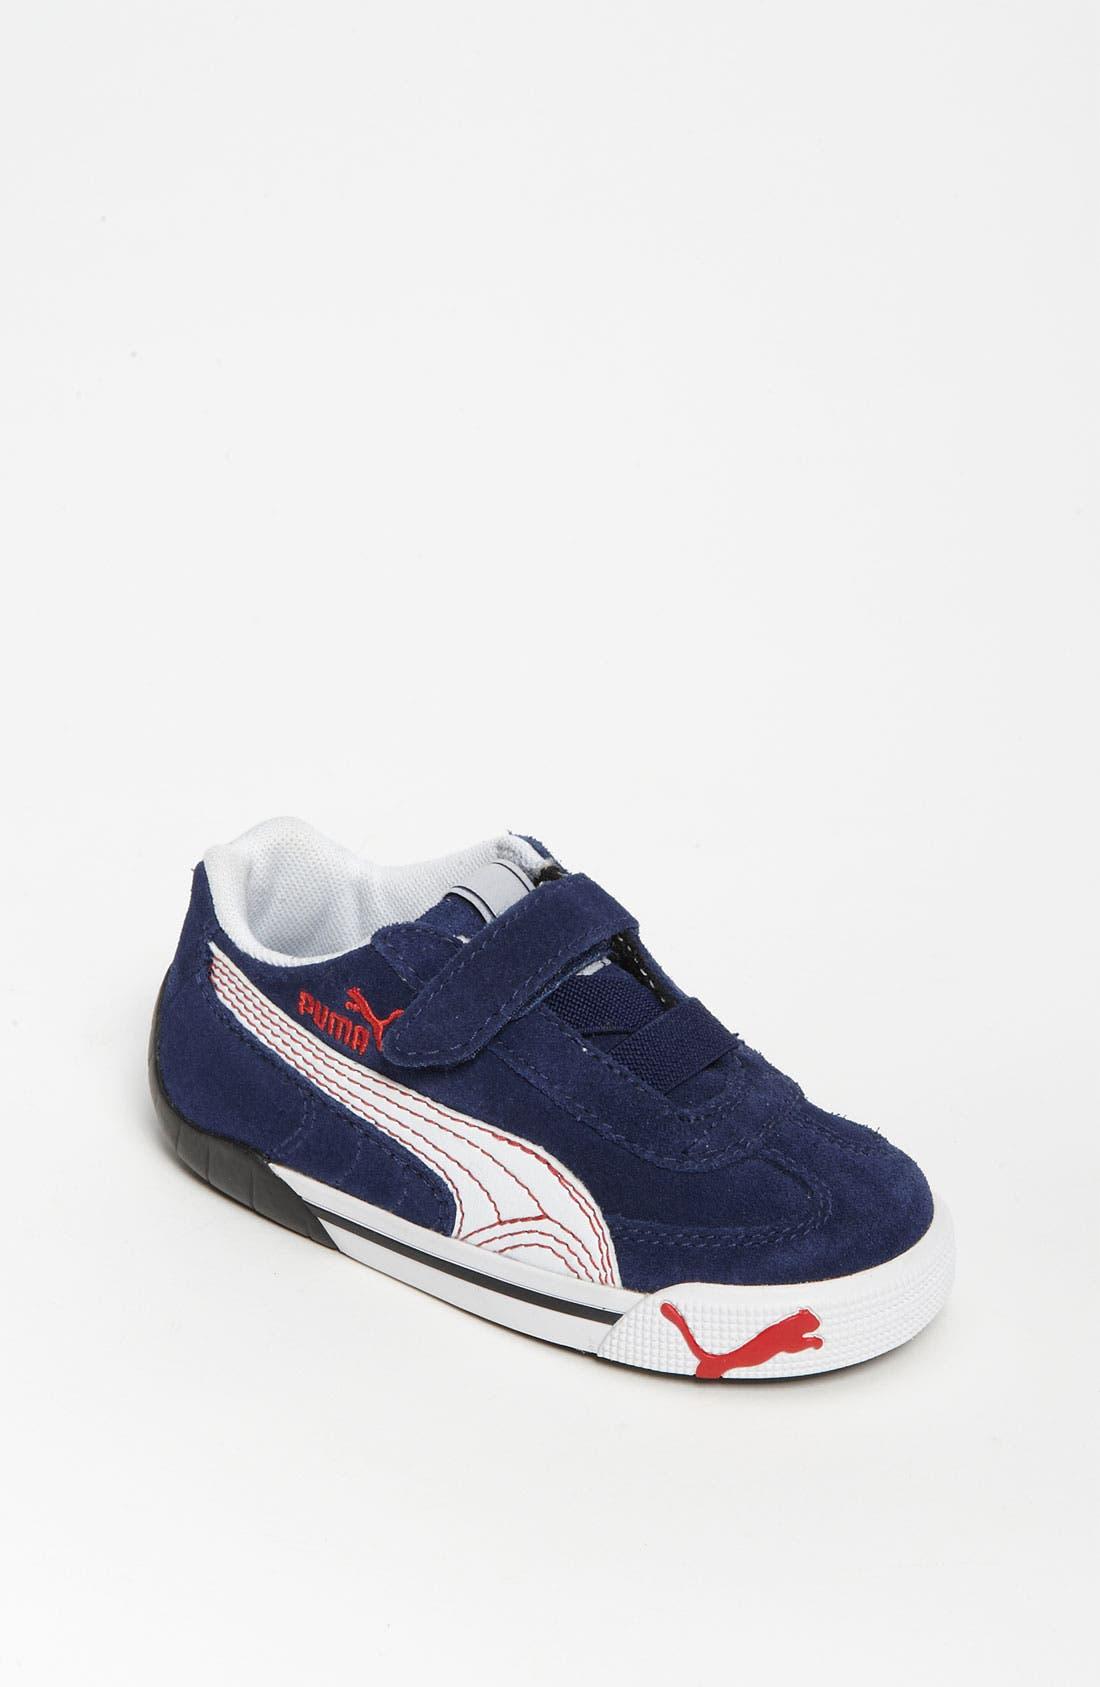 Alternate Image 1 Selected - Puma 'Speed Cat 2.9' Sneaker (Walker & Toddler)